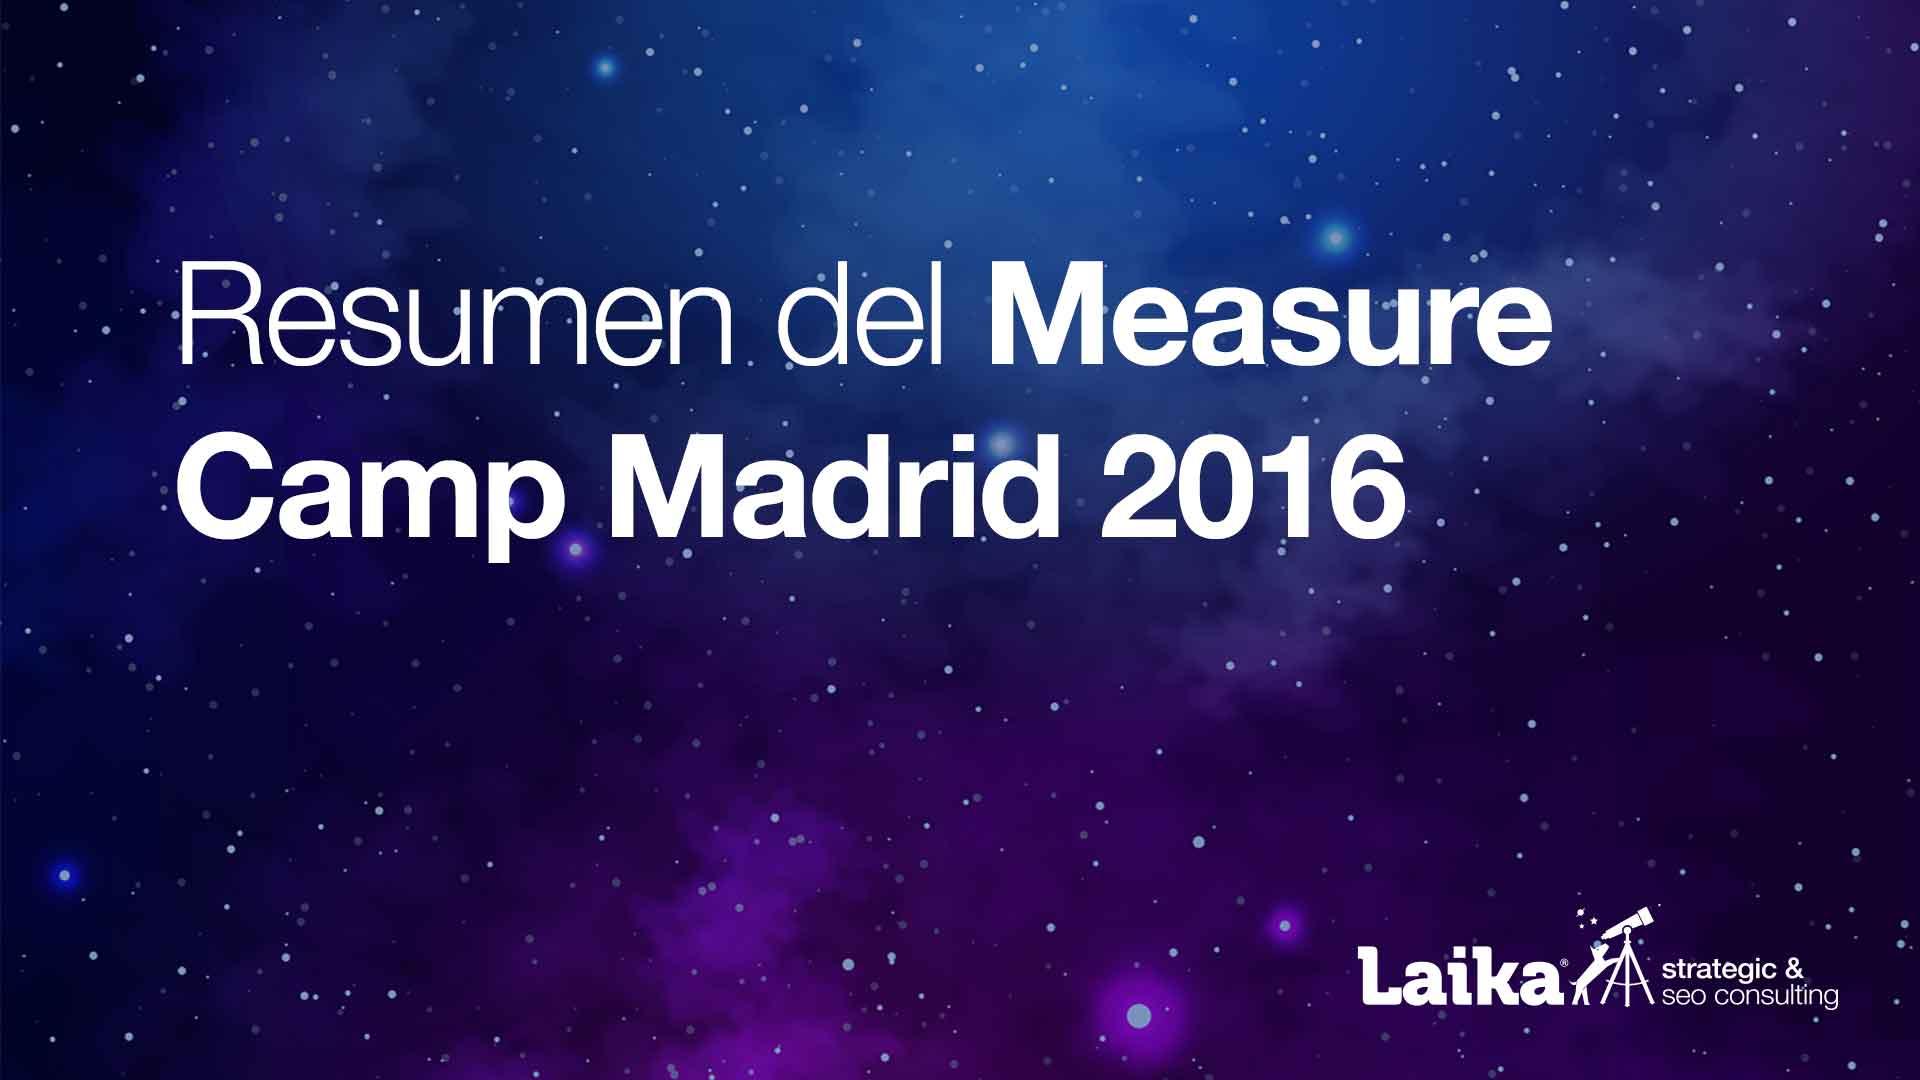 Resumen del Measure Camp Madrid 2016